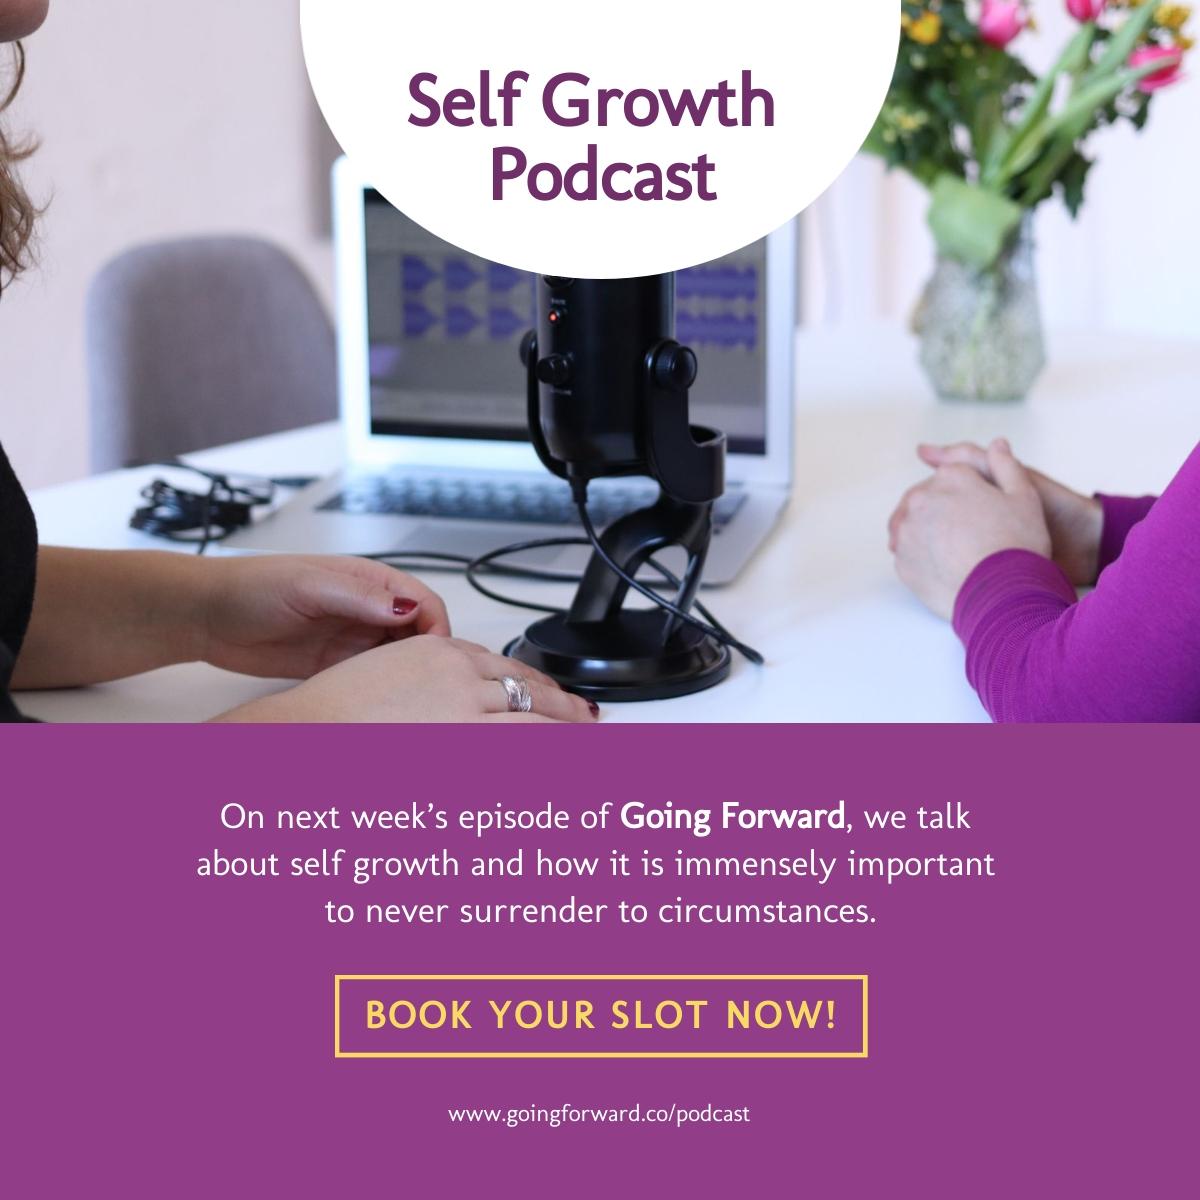 Self Growth Podcast - LinkedIn Post Template